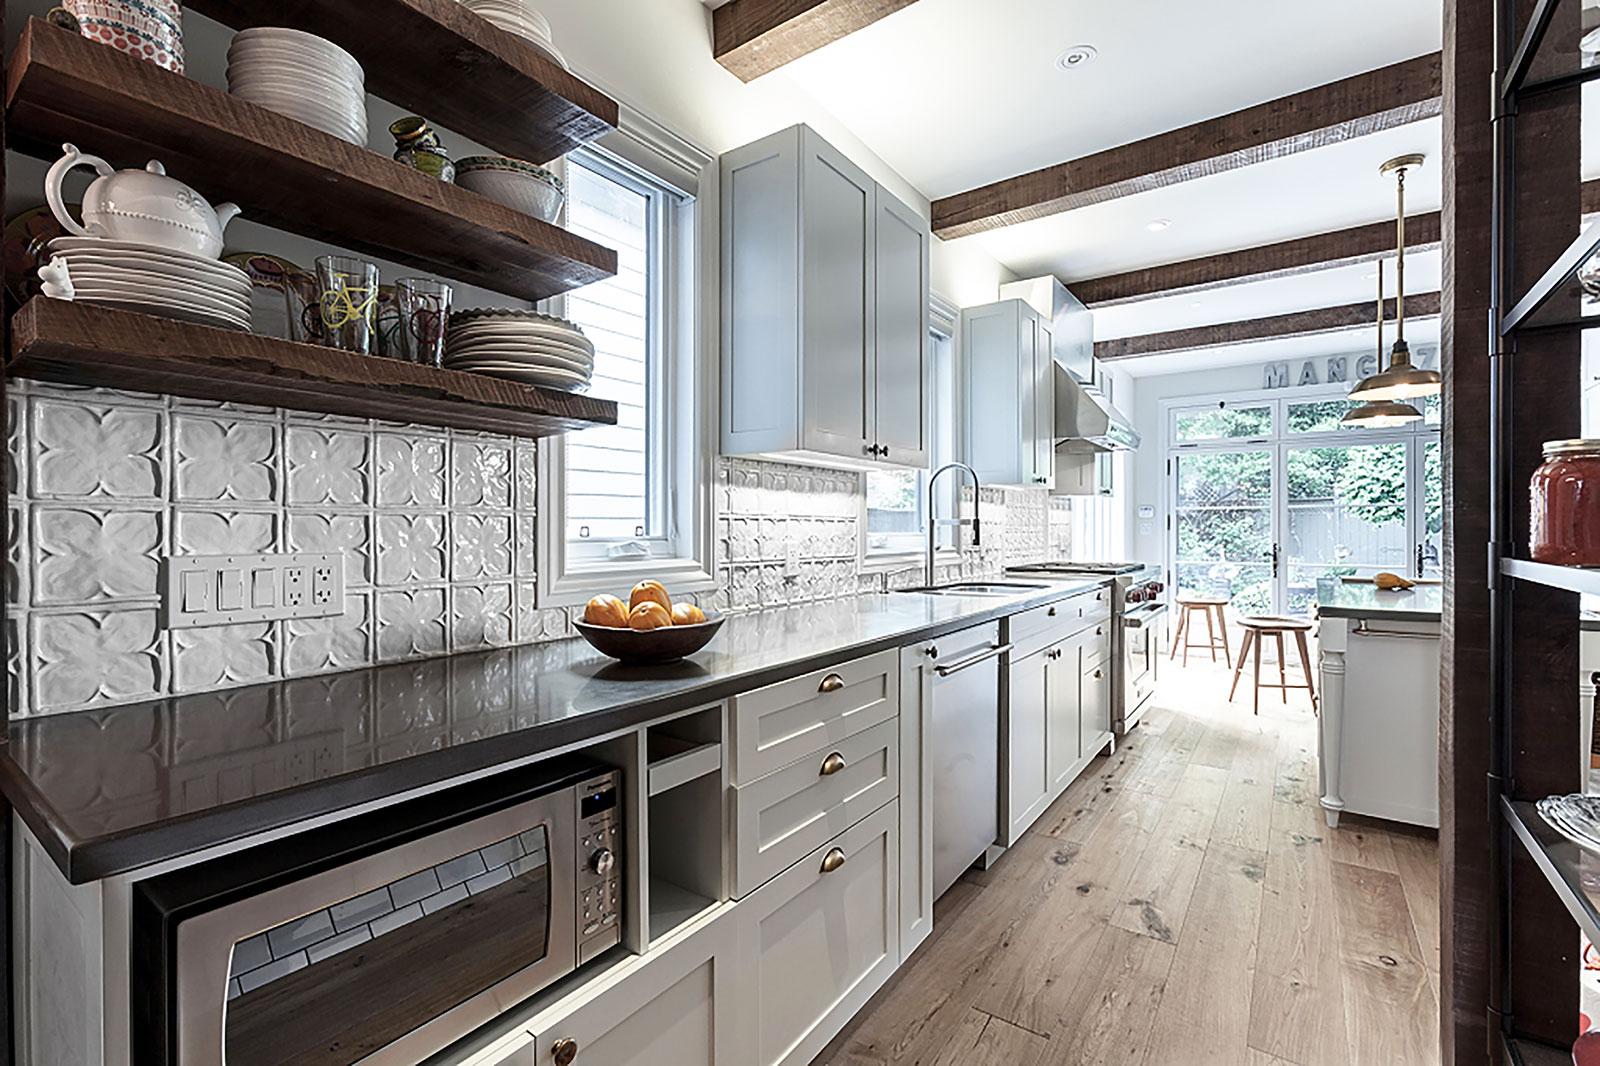 handmade white kitchen backsplash